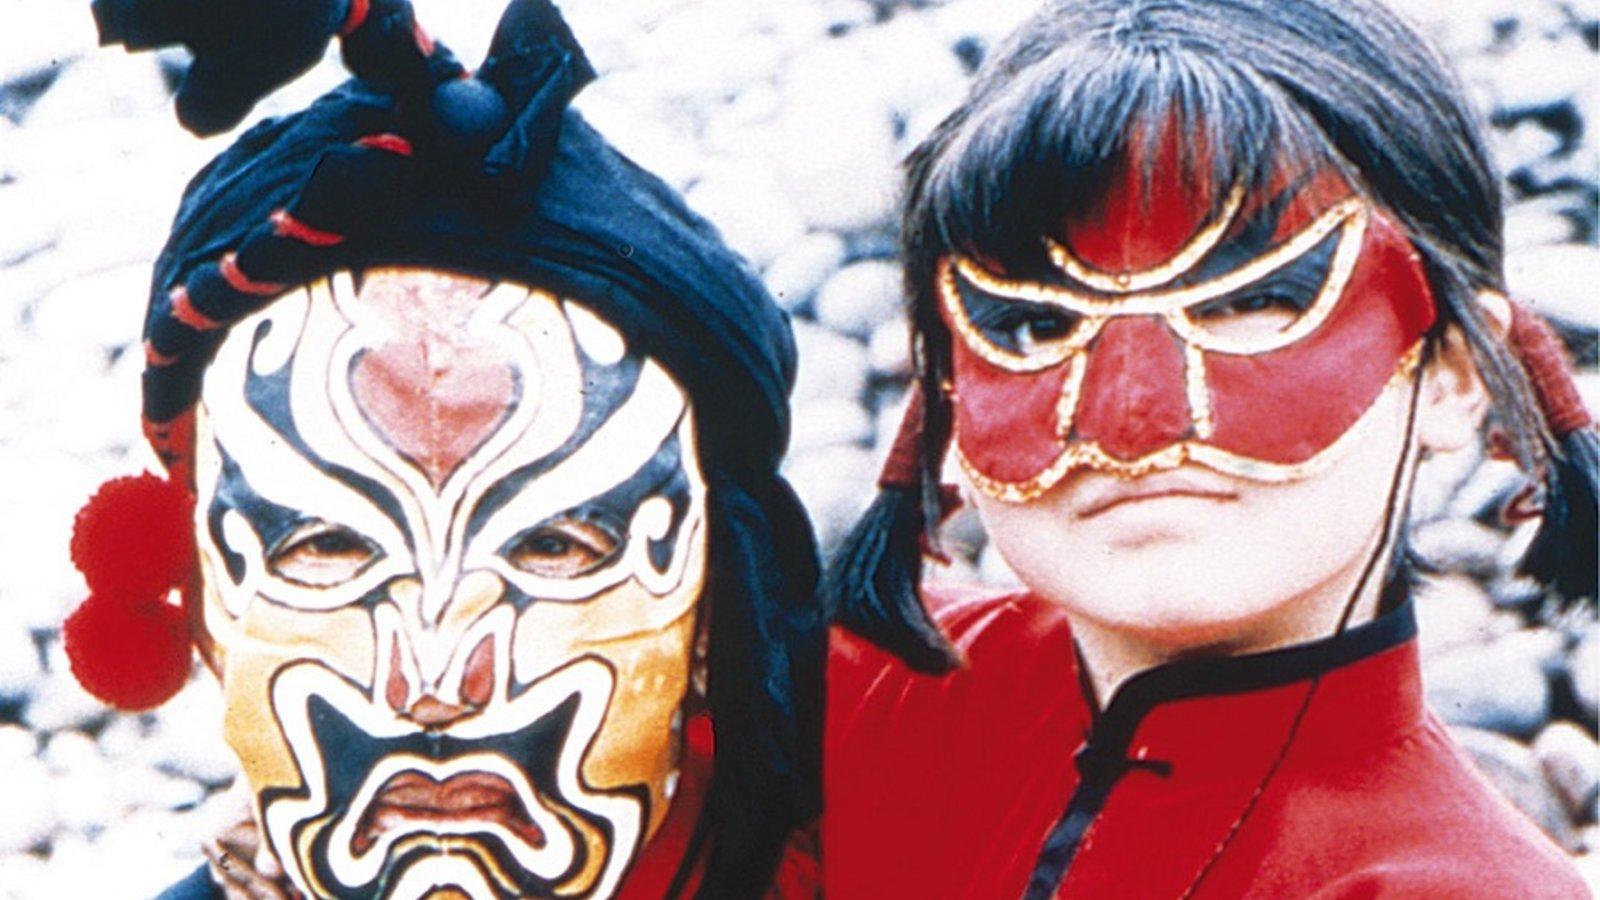 The King of Masks - Bian Lian